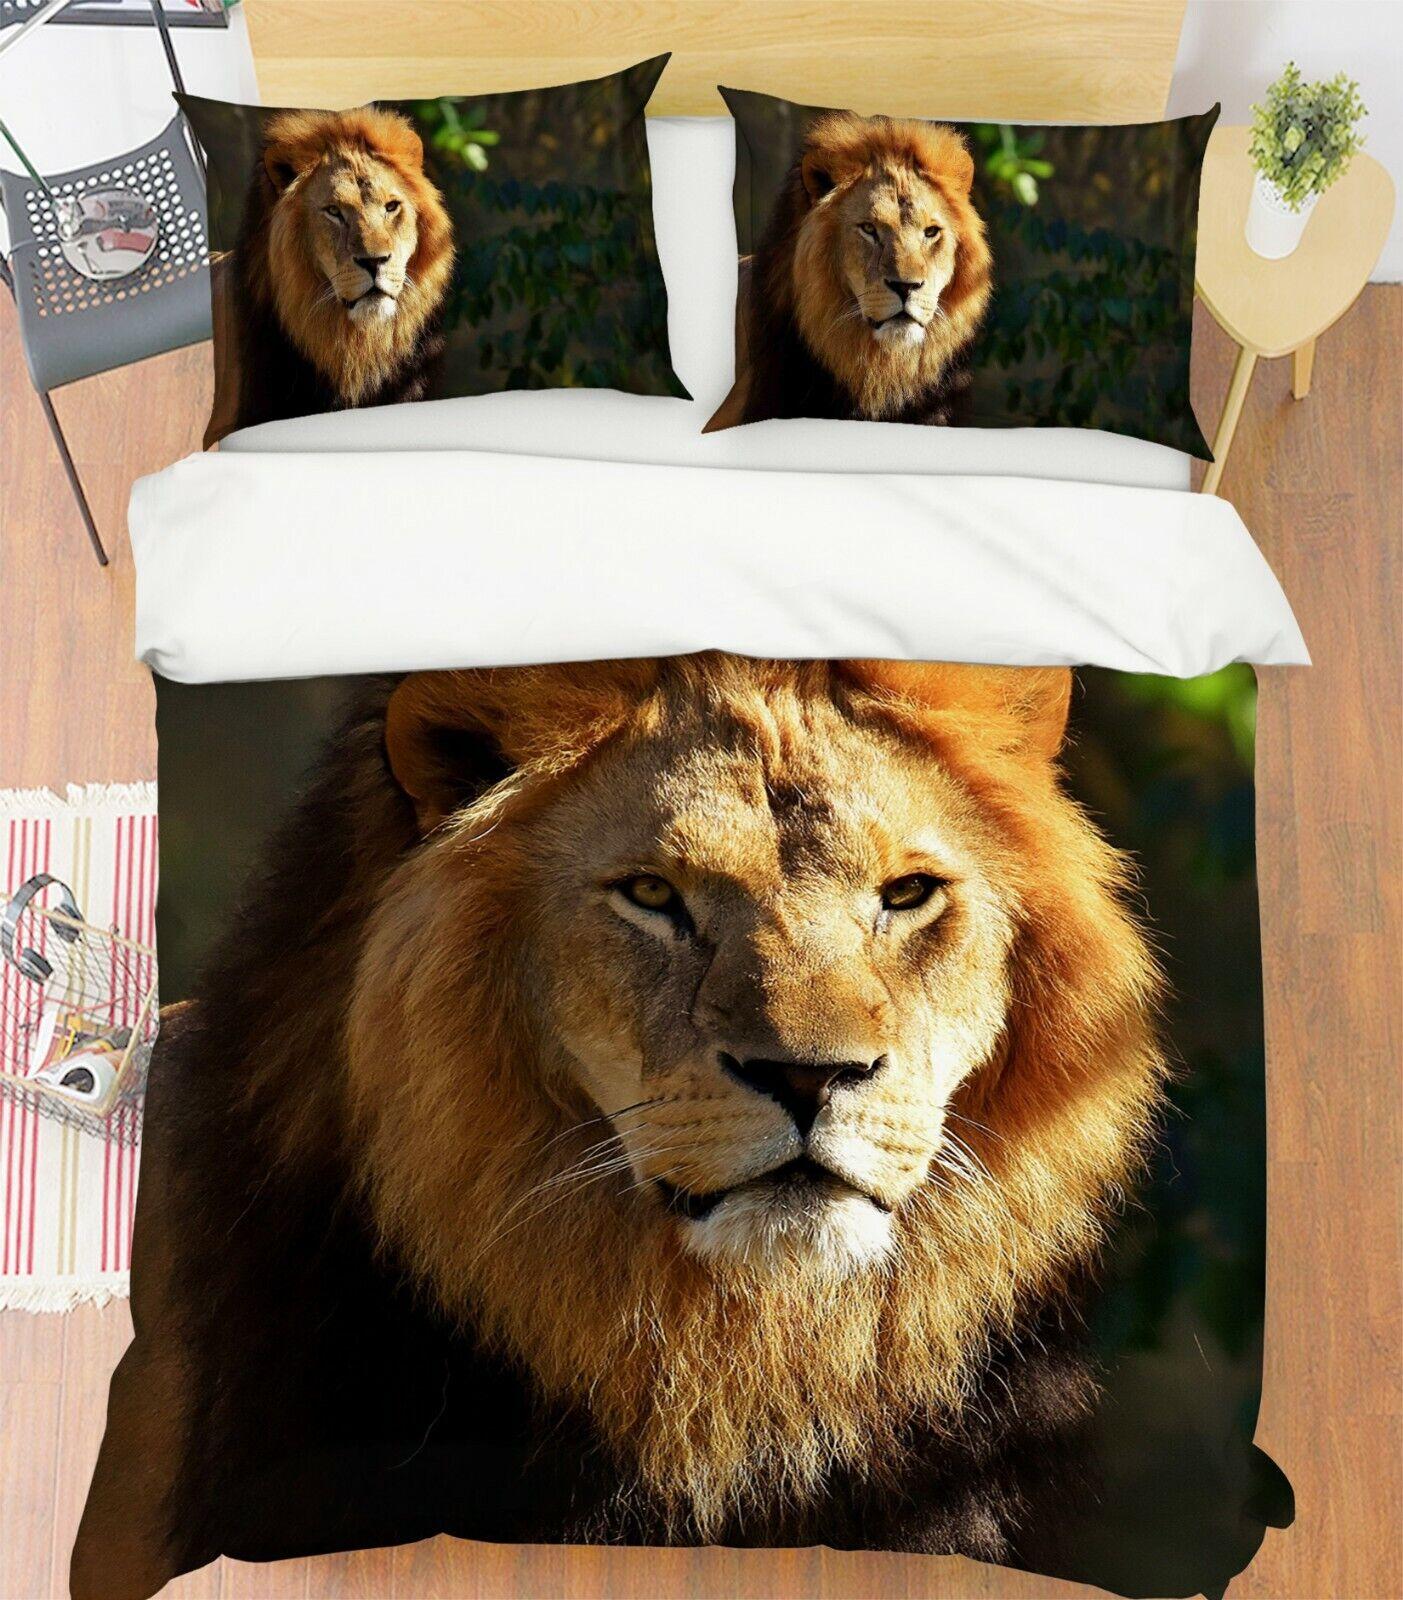 3D Lion I70 Animal Bett Pillowcases Quilt Duvet Startseite Königin König Angelia